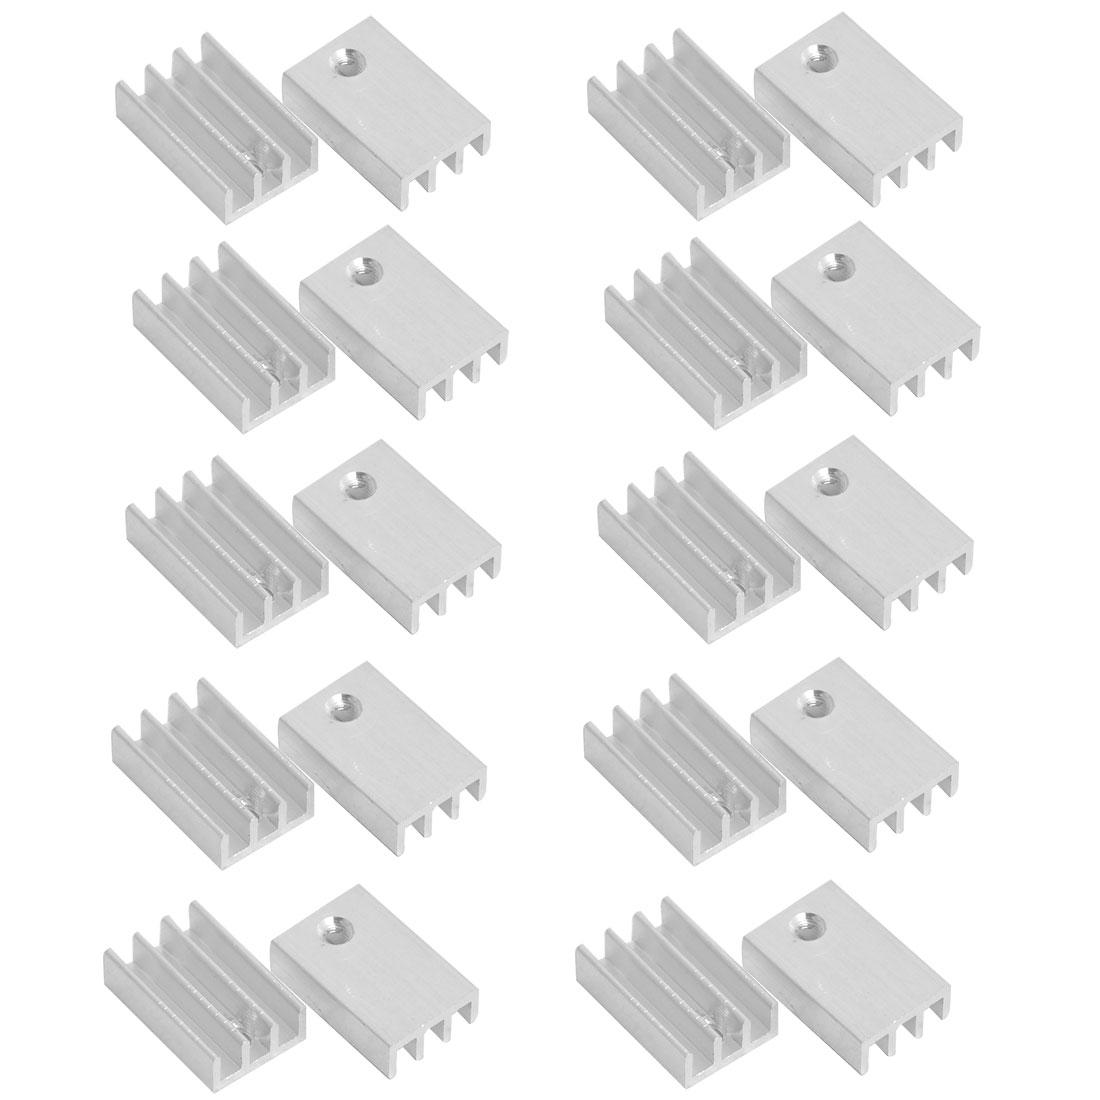 Aluminium Heatsink Cooling Fin Cooler Silver Tone 17mm x 11mm x 5mm 20 Pcs